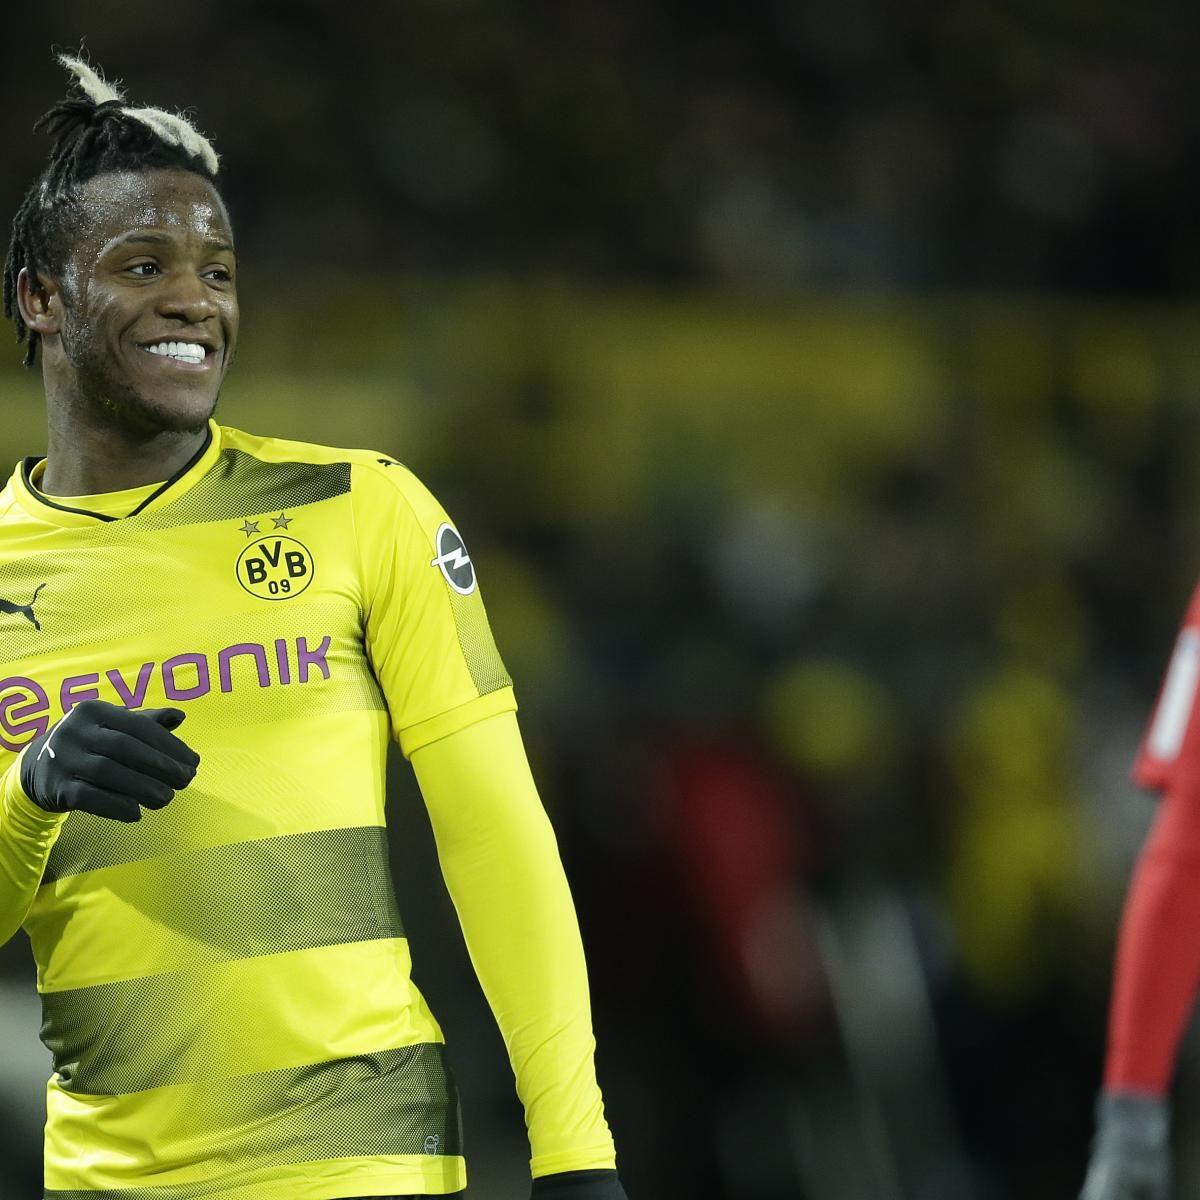 Chelsea Transfer News Michy Batshuayi Fee Rumoured As Dortmund Hunt Summer Deal Borussia Dortmund Dortmund Bvb